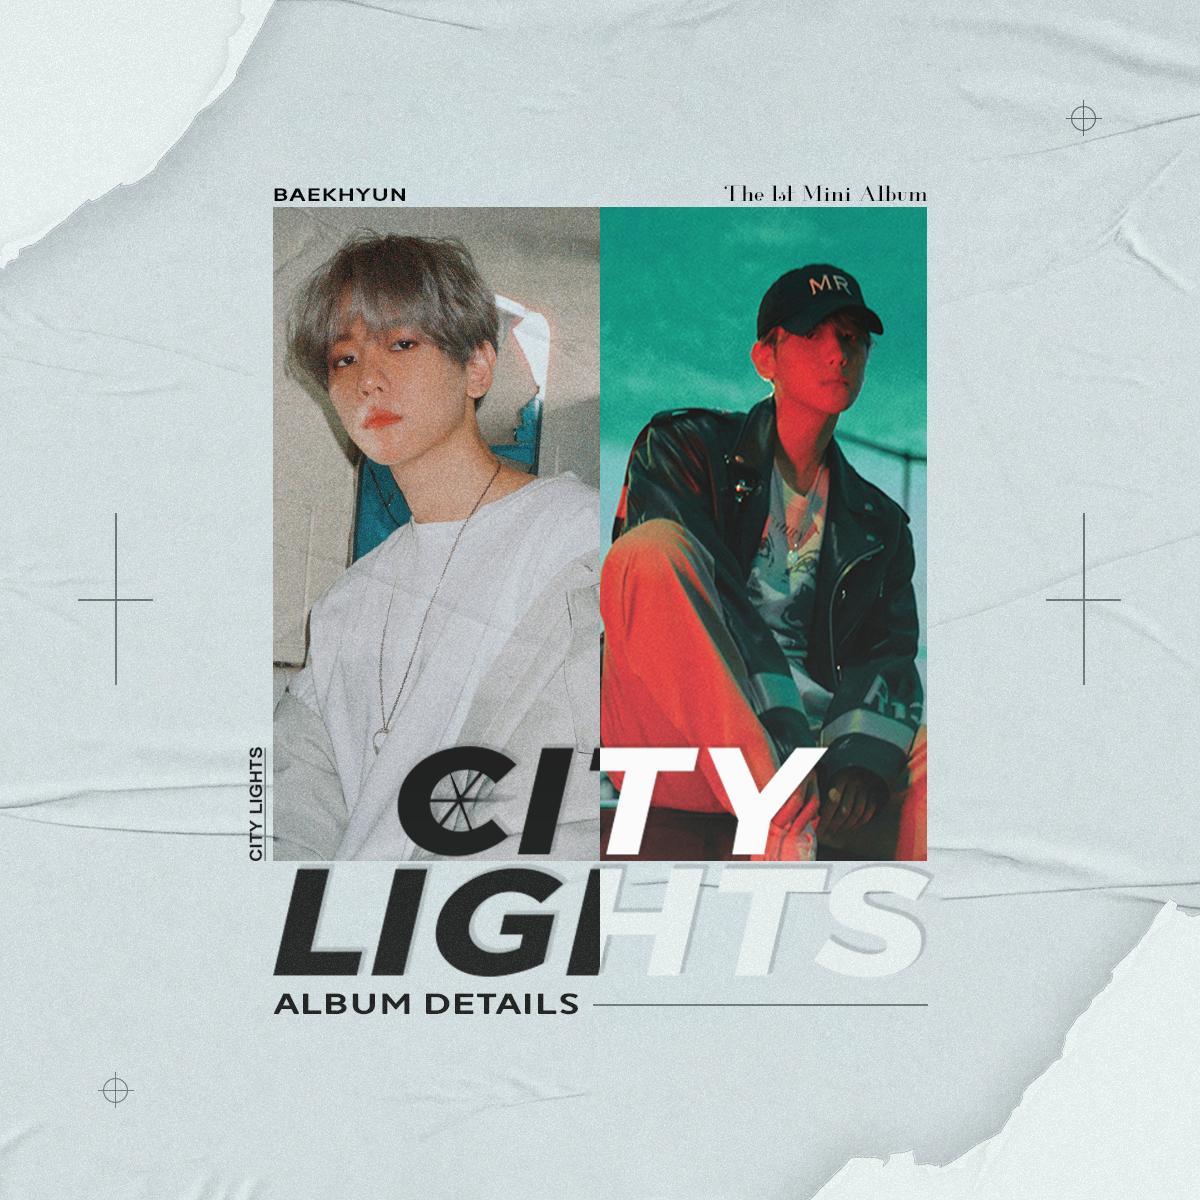 Exo Schedule On Twitter Baekhyun 1st Mini Album City Lights